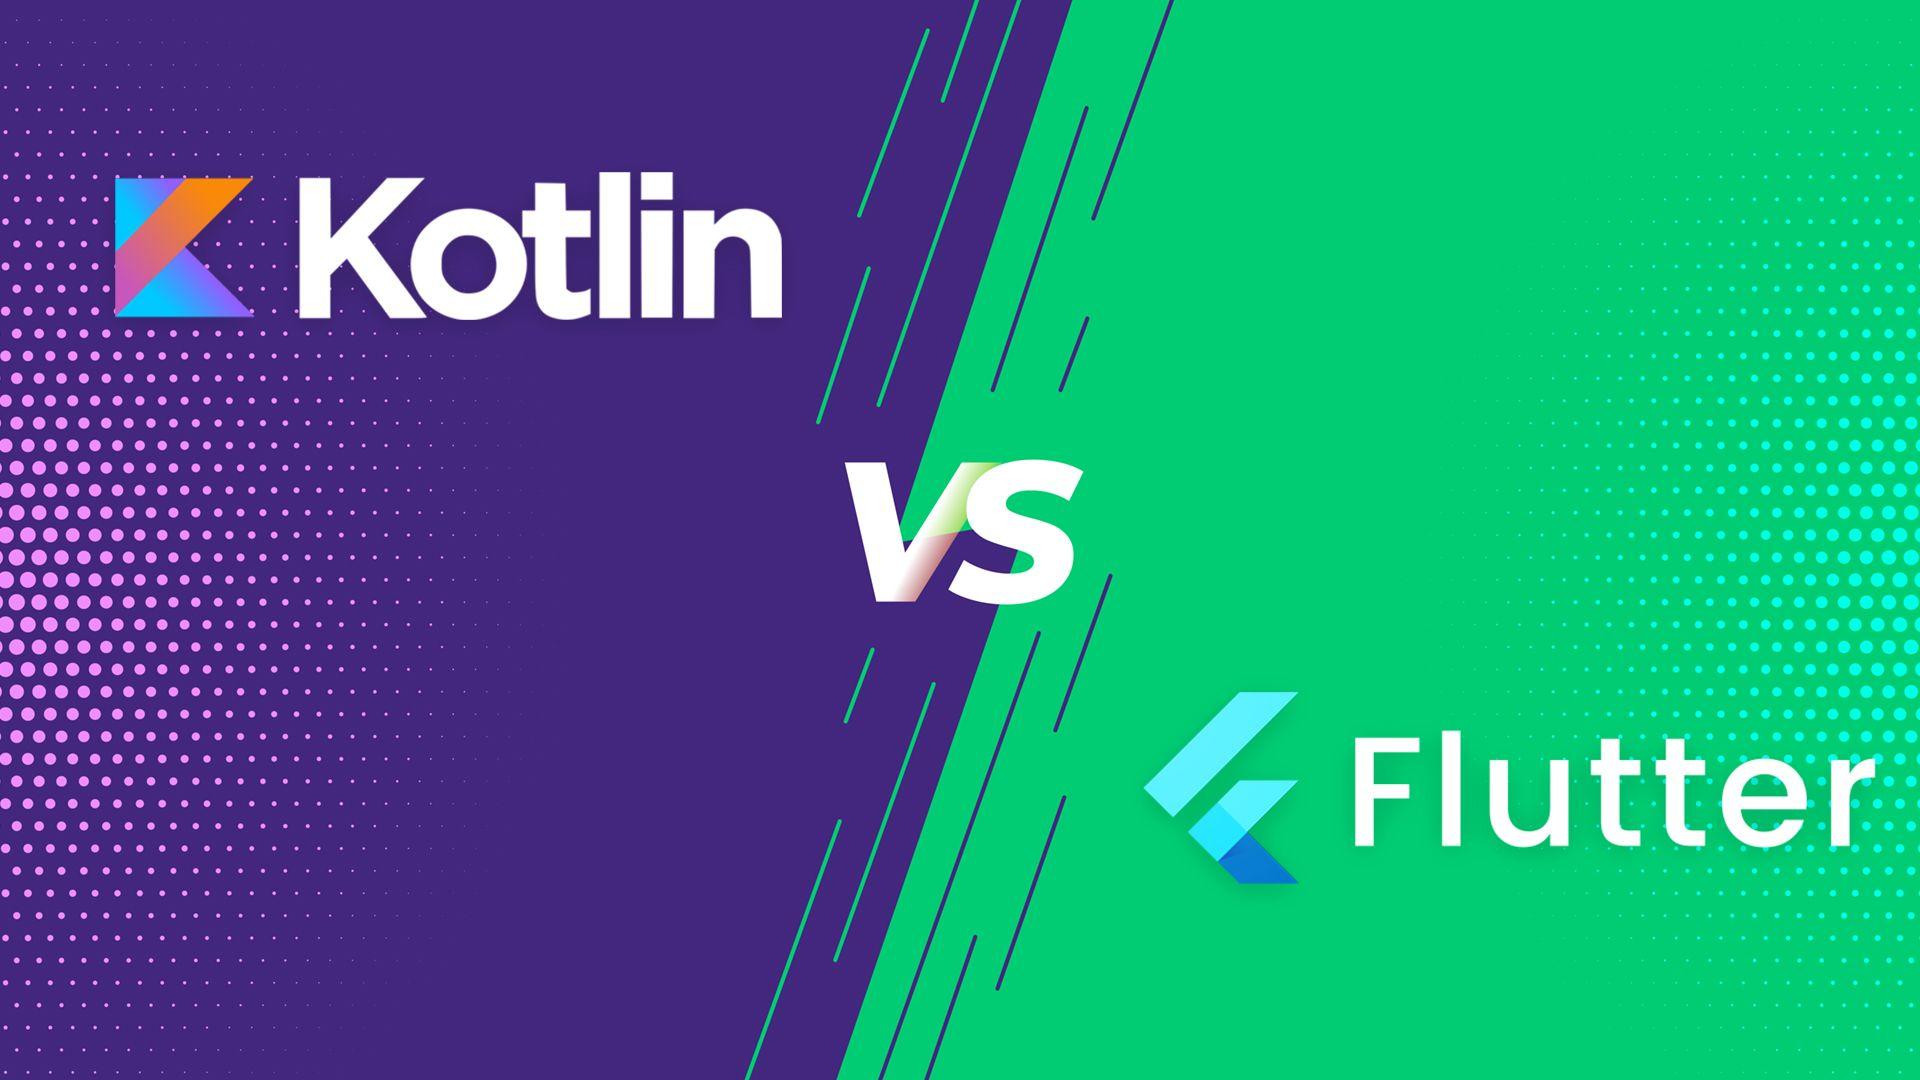 /kotlin-vs-flutter-which-one-races-ahead-vk1d3tu4 feature image